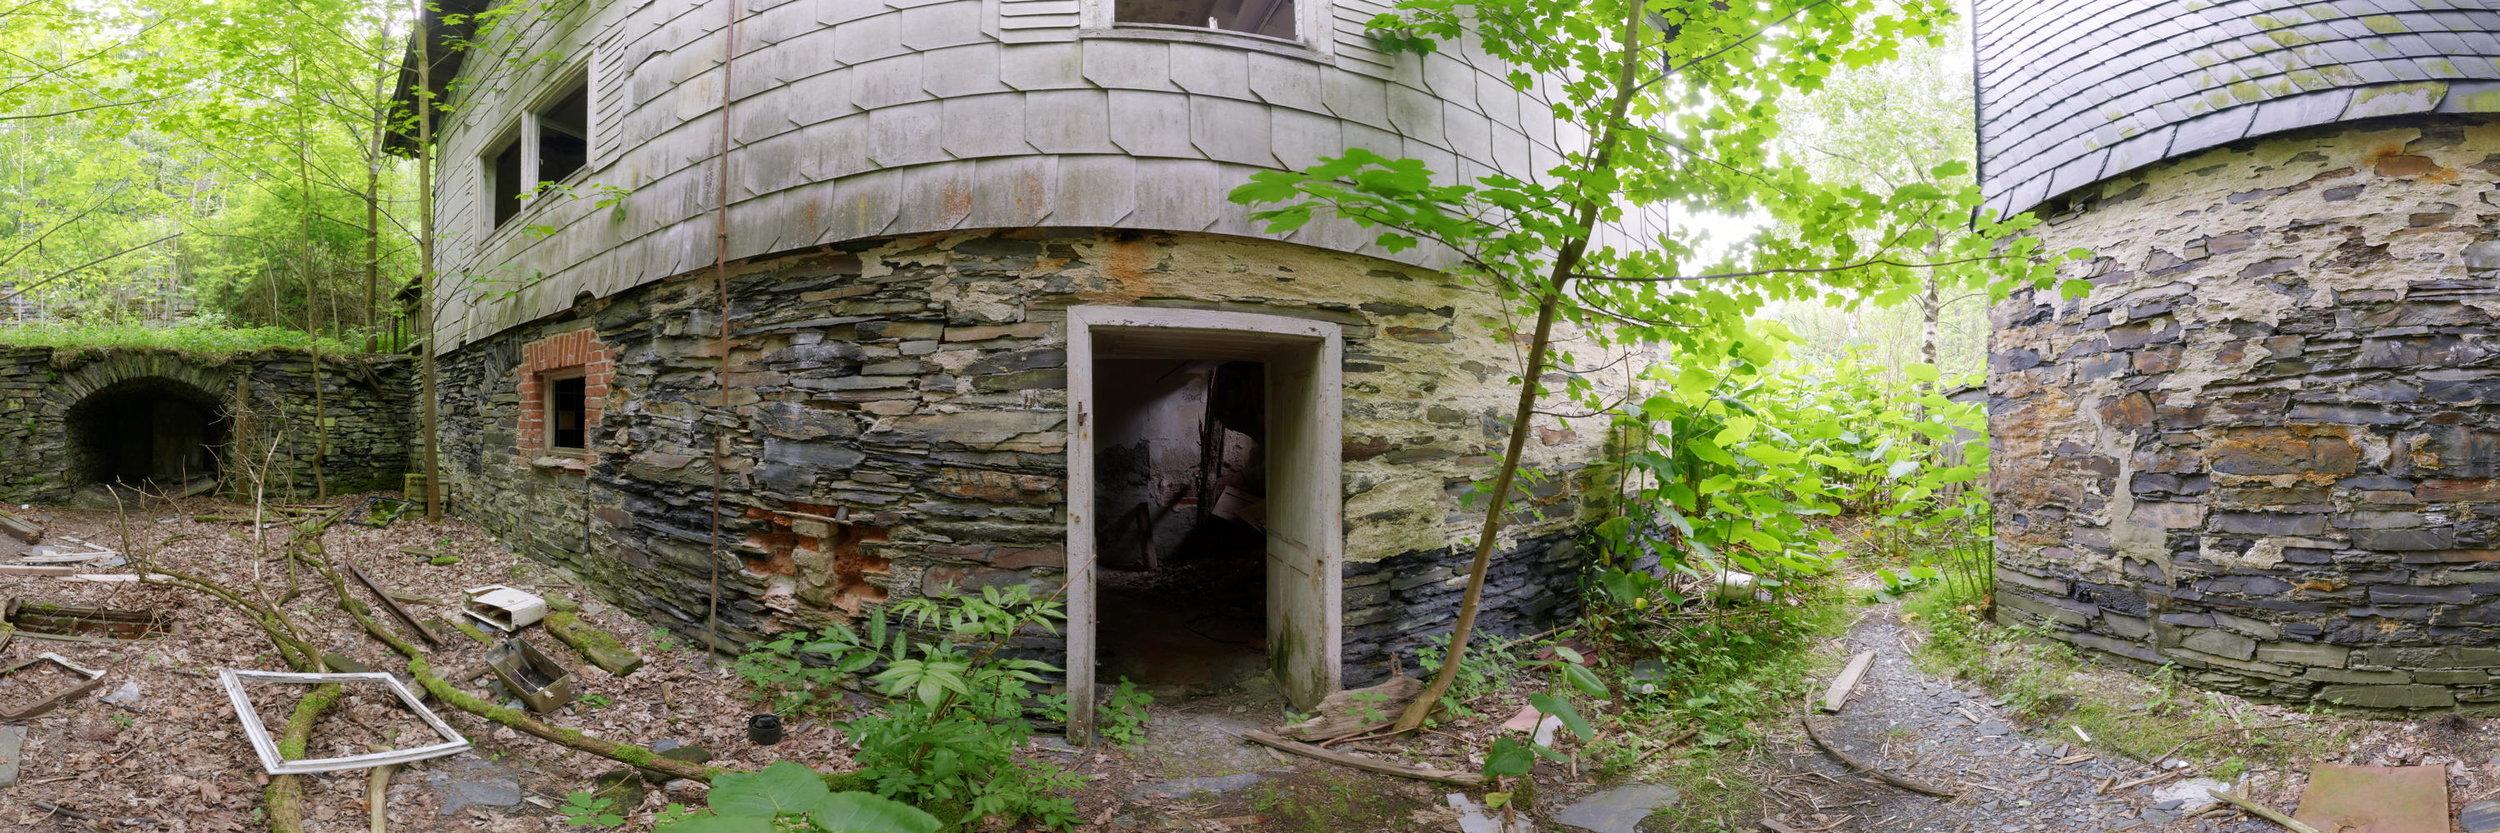 Tunneleingang2.jpg